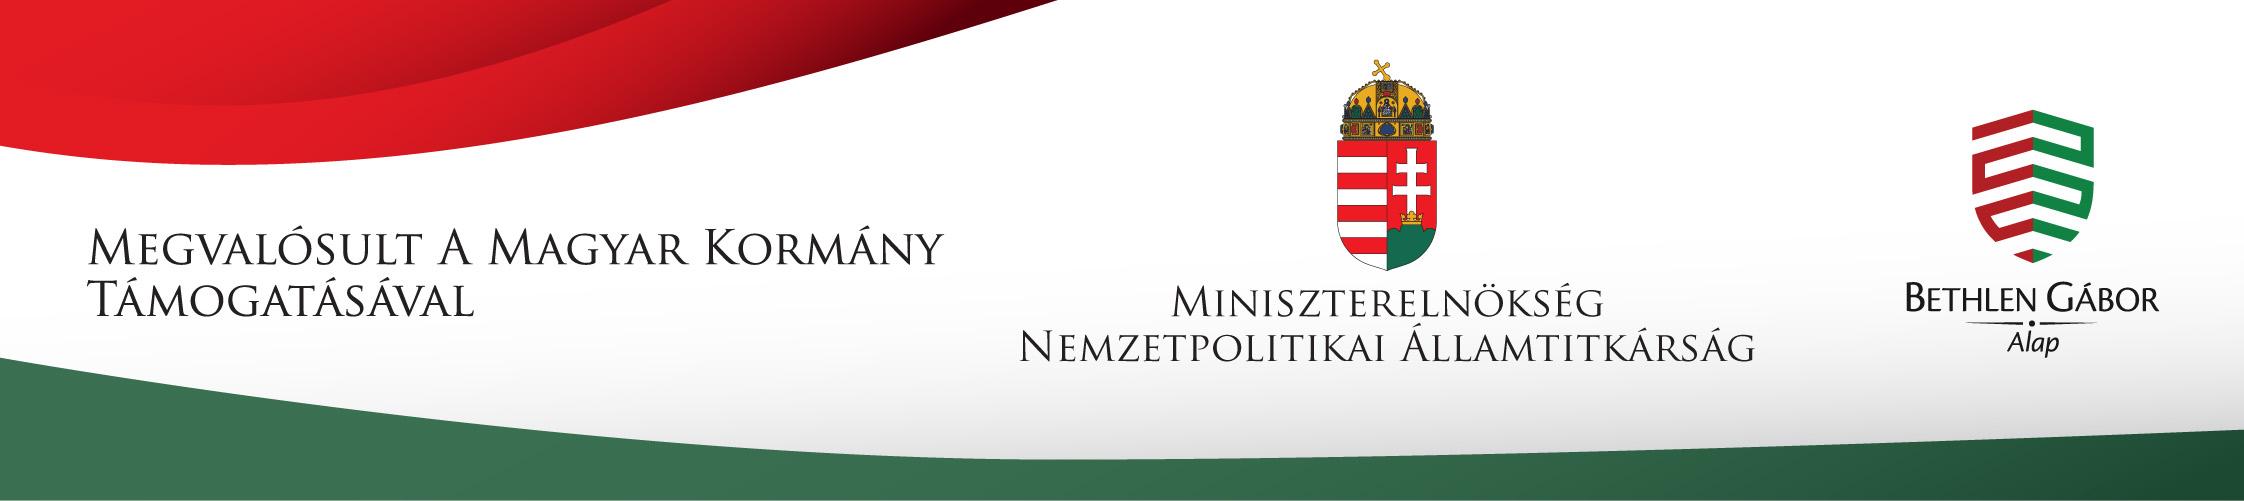 Hataron_megvalosult_a_magyar_kormany_tamogatasaval_bga_alap